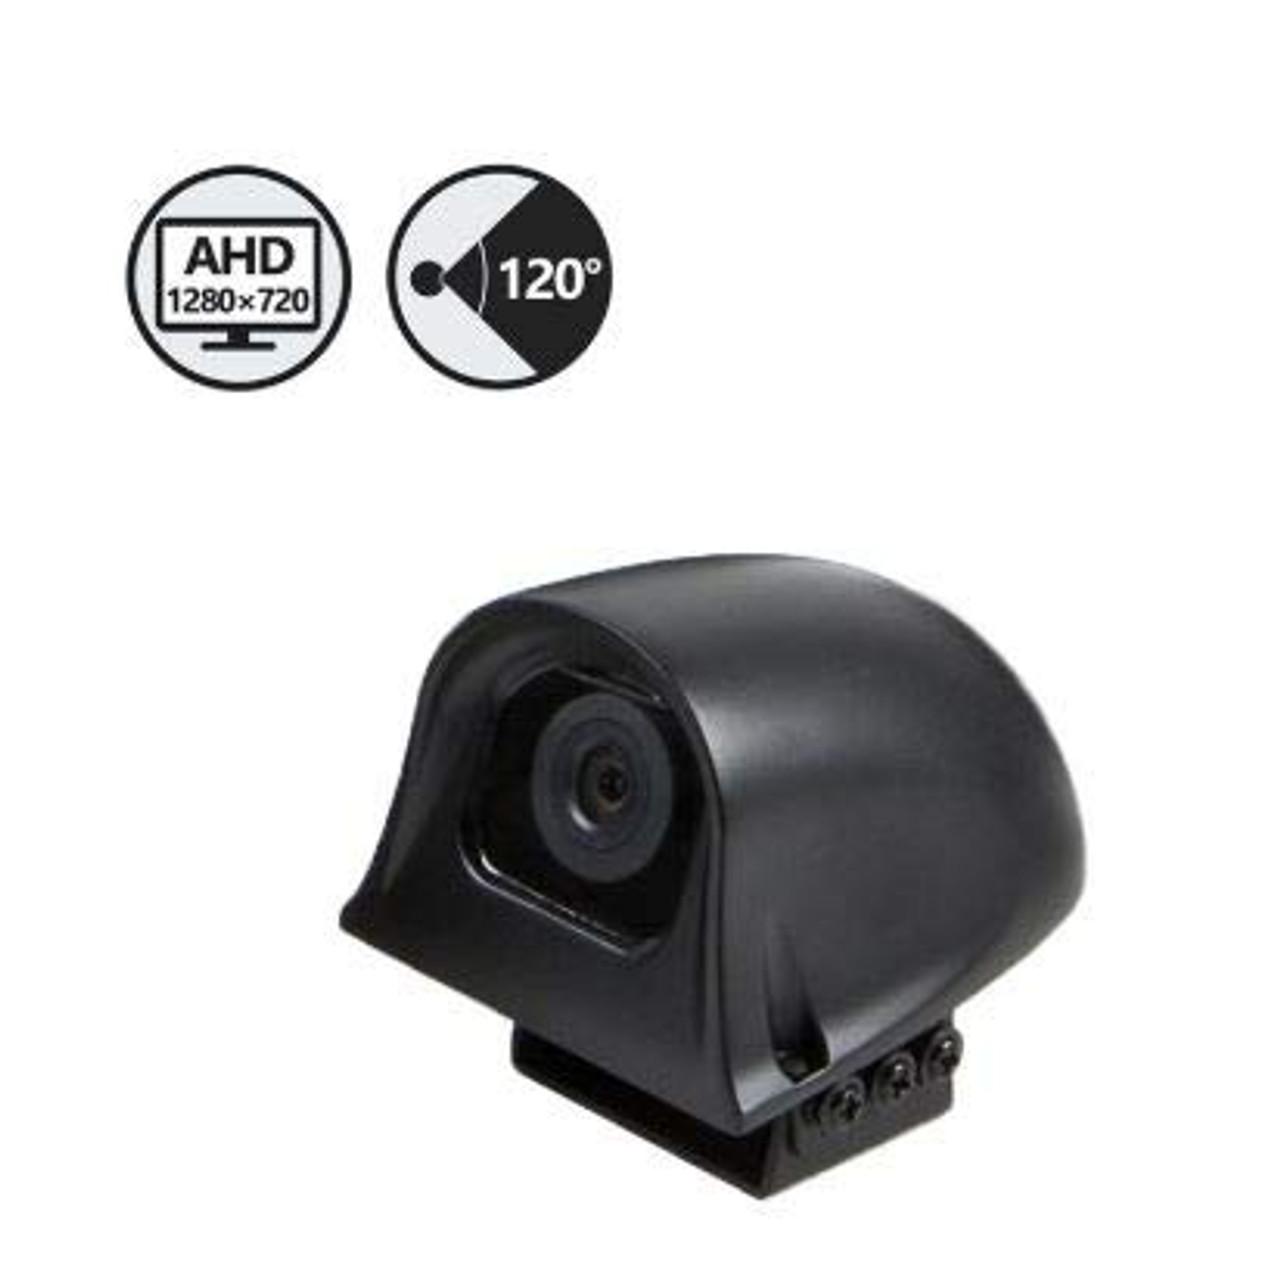 AHD 120° Side Camera (RVS-775-AHD)